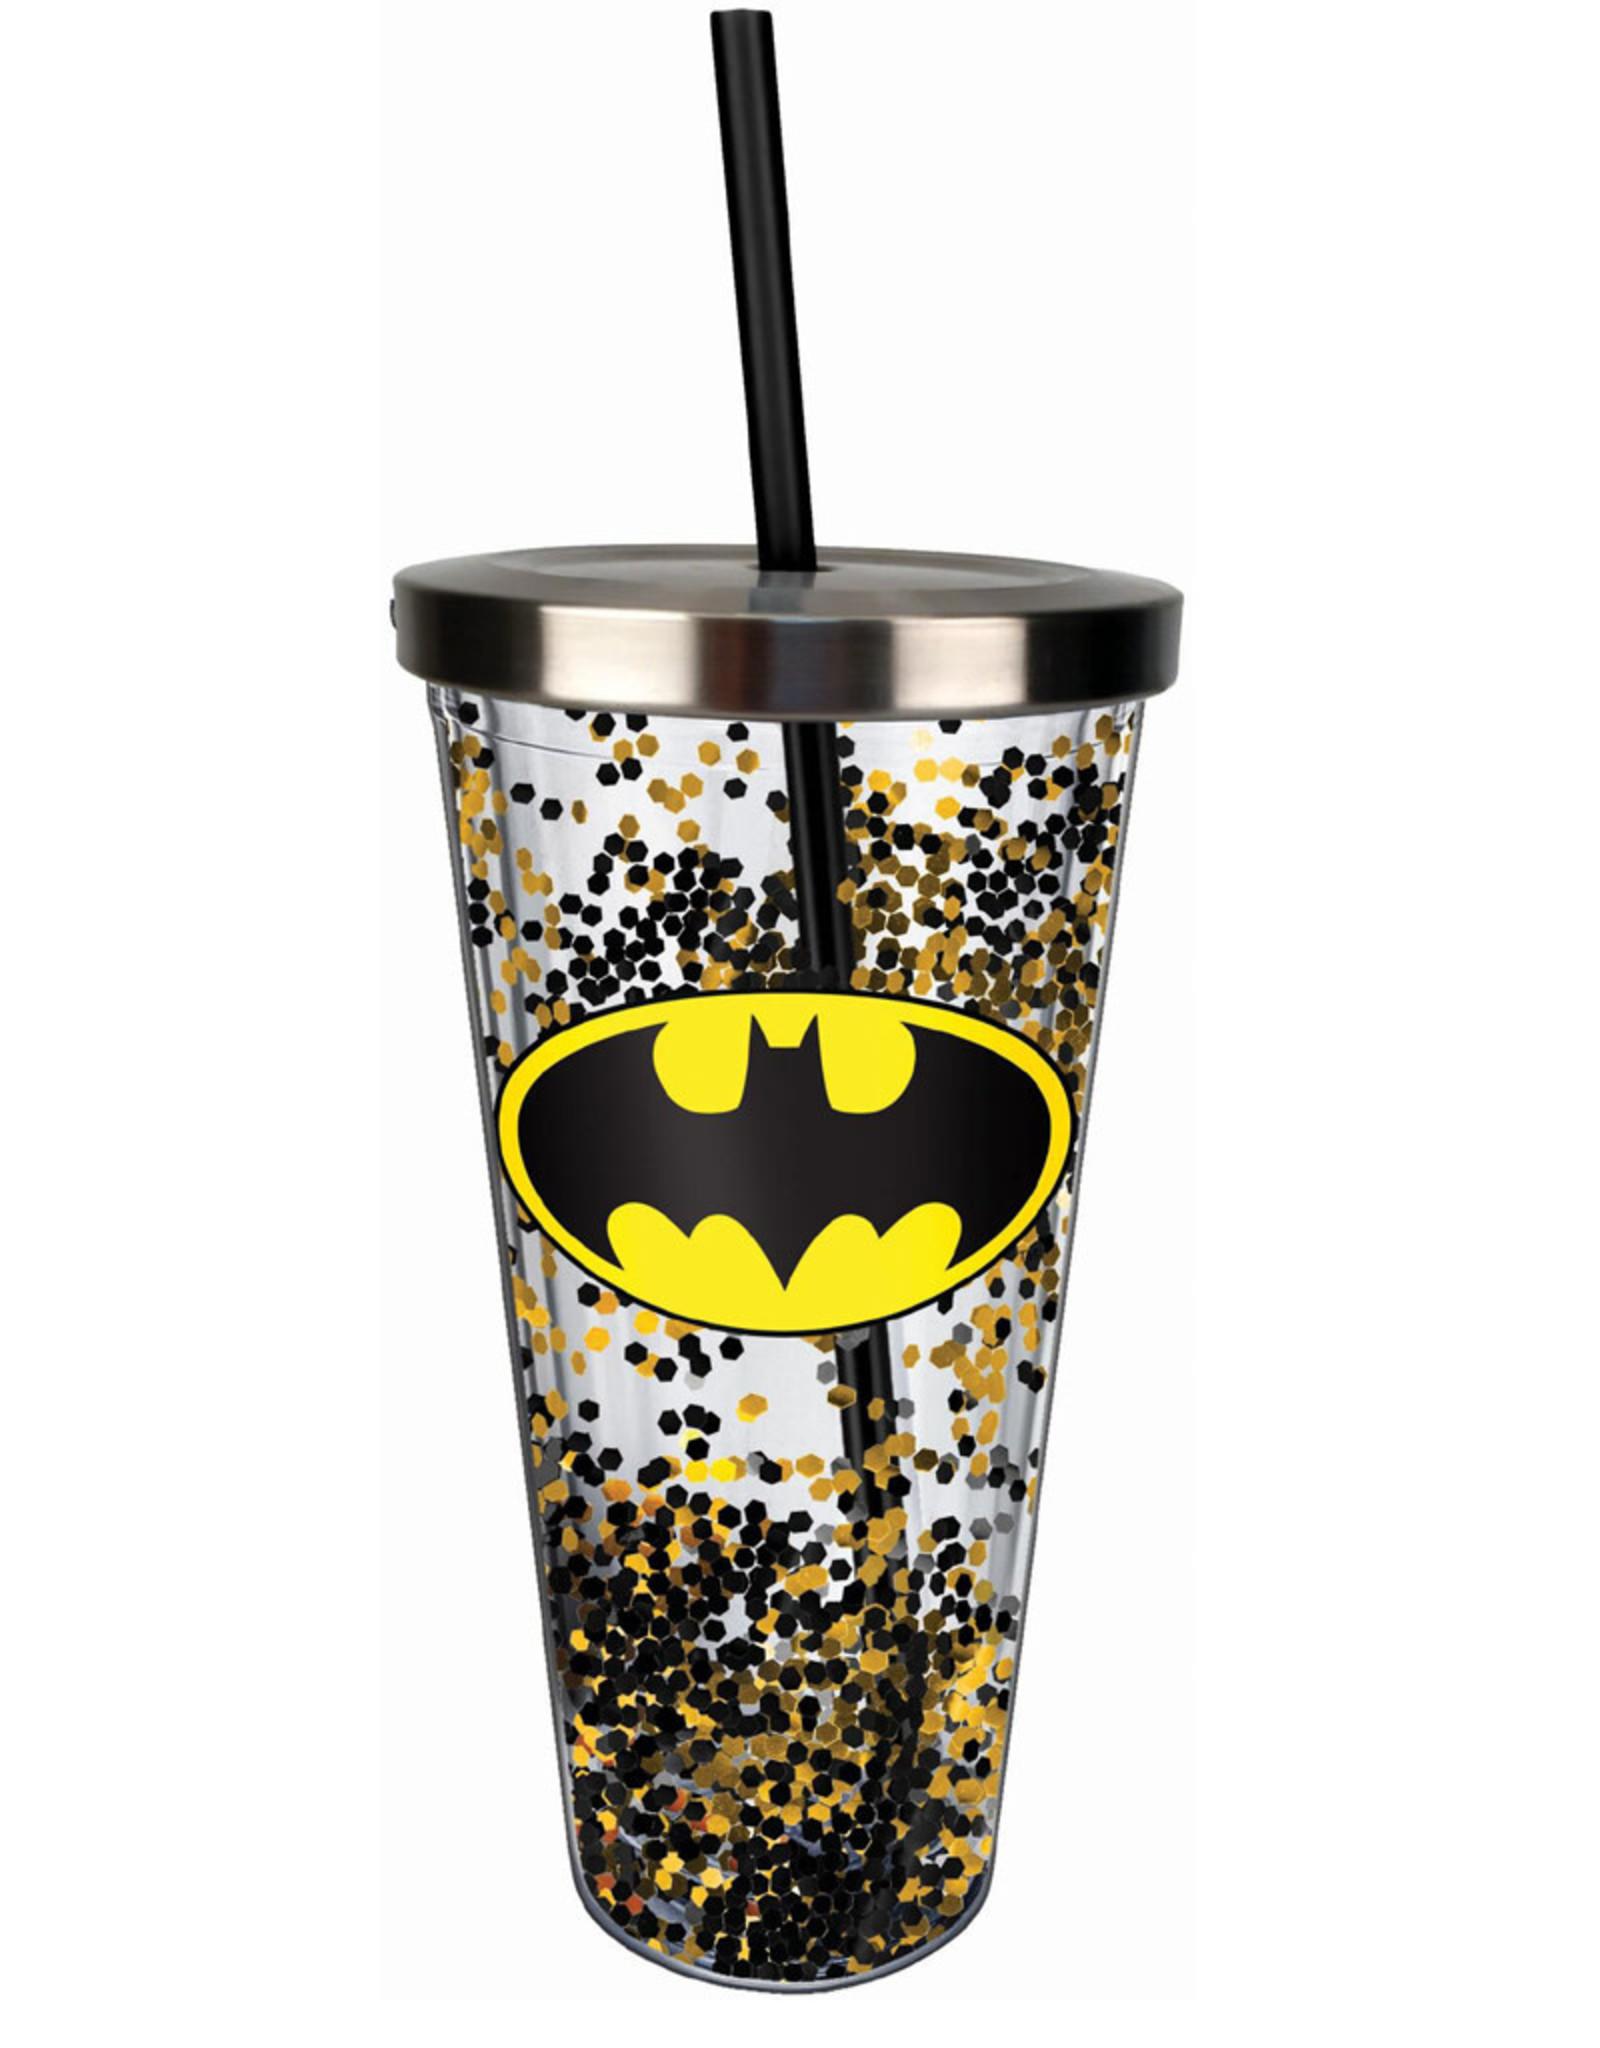 Dc comics Dc Comics ( Shiny Travel Glass ) Batman